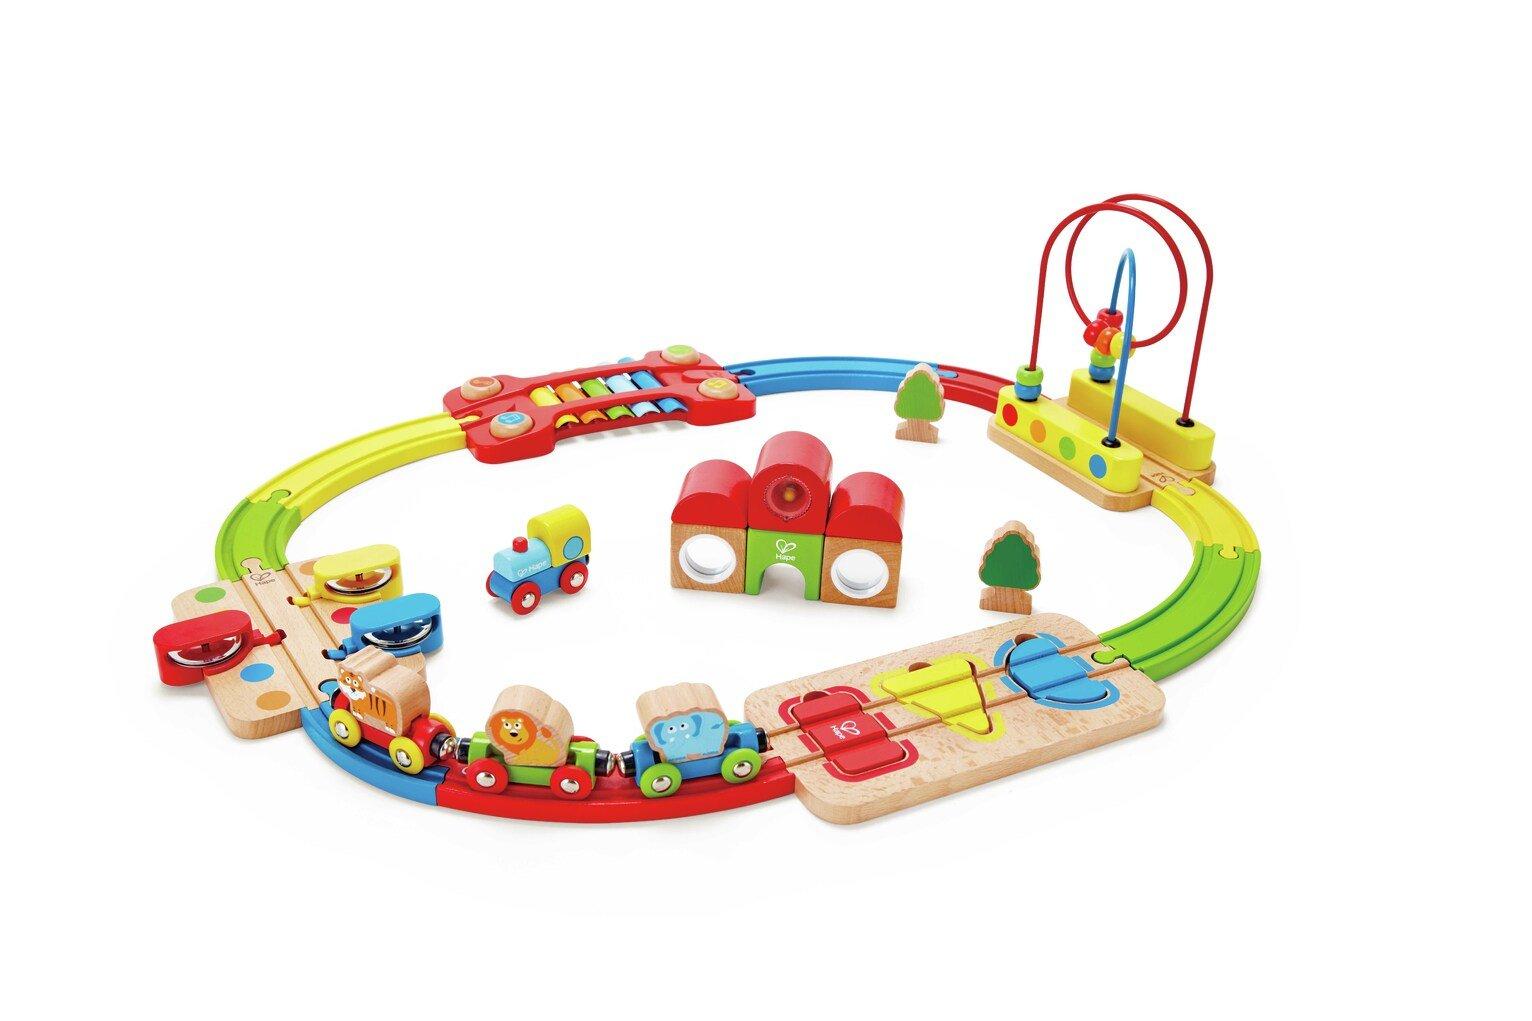 Hape Rainbow Puzzle Railway Set